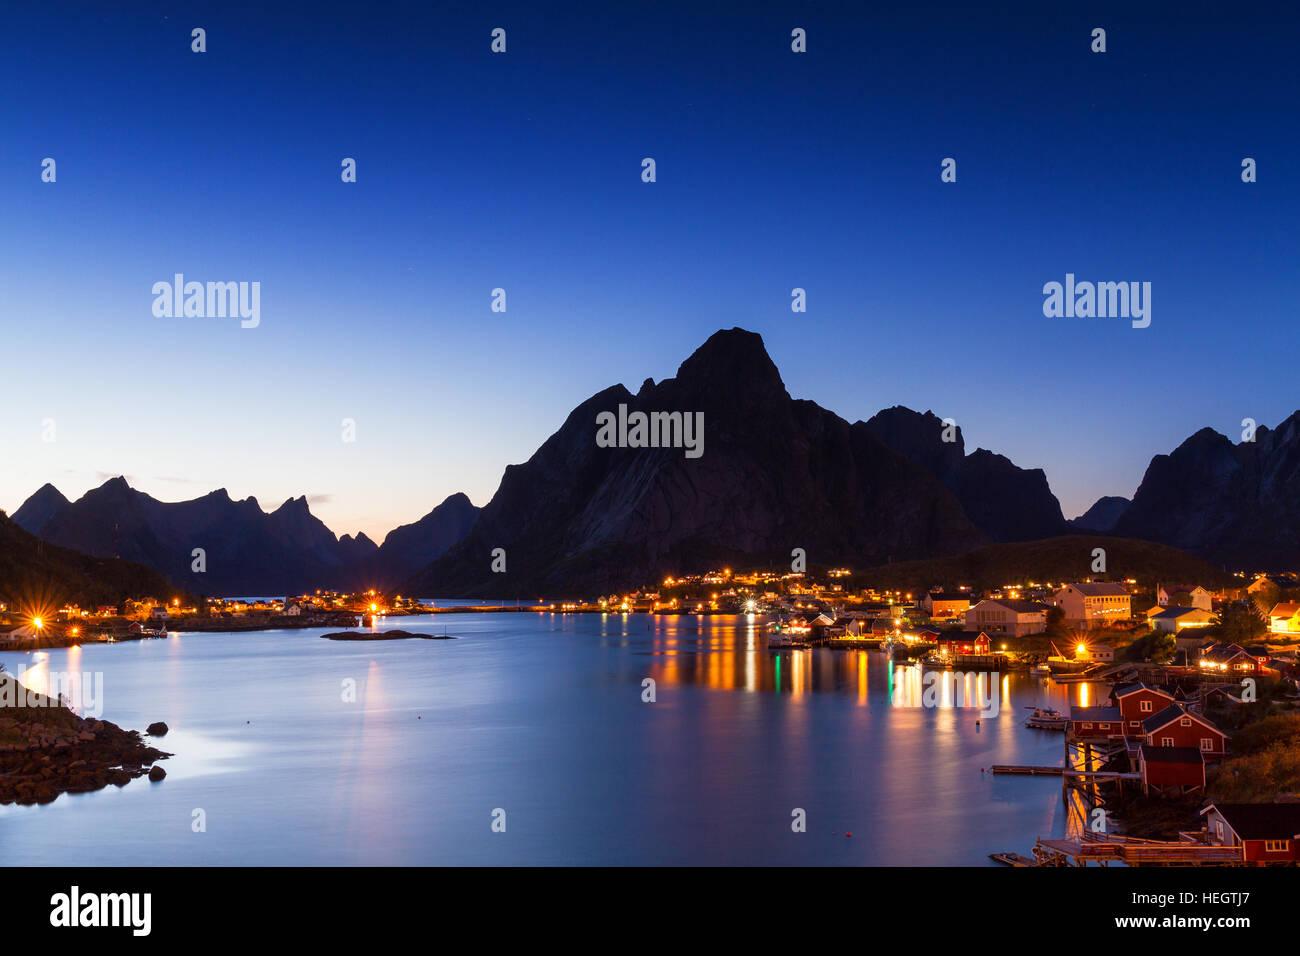 Village of Reine at twilight, Lofoten, Norway Stock Photo